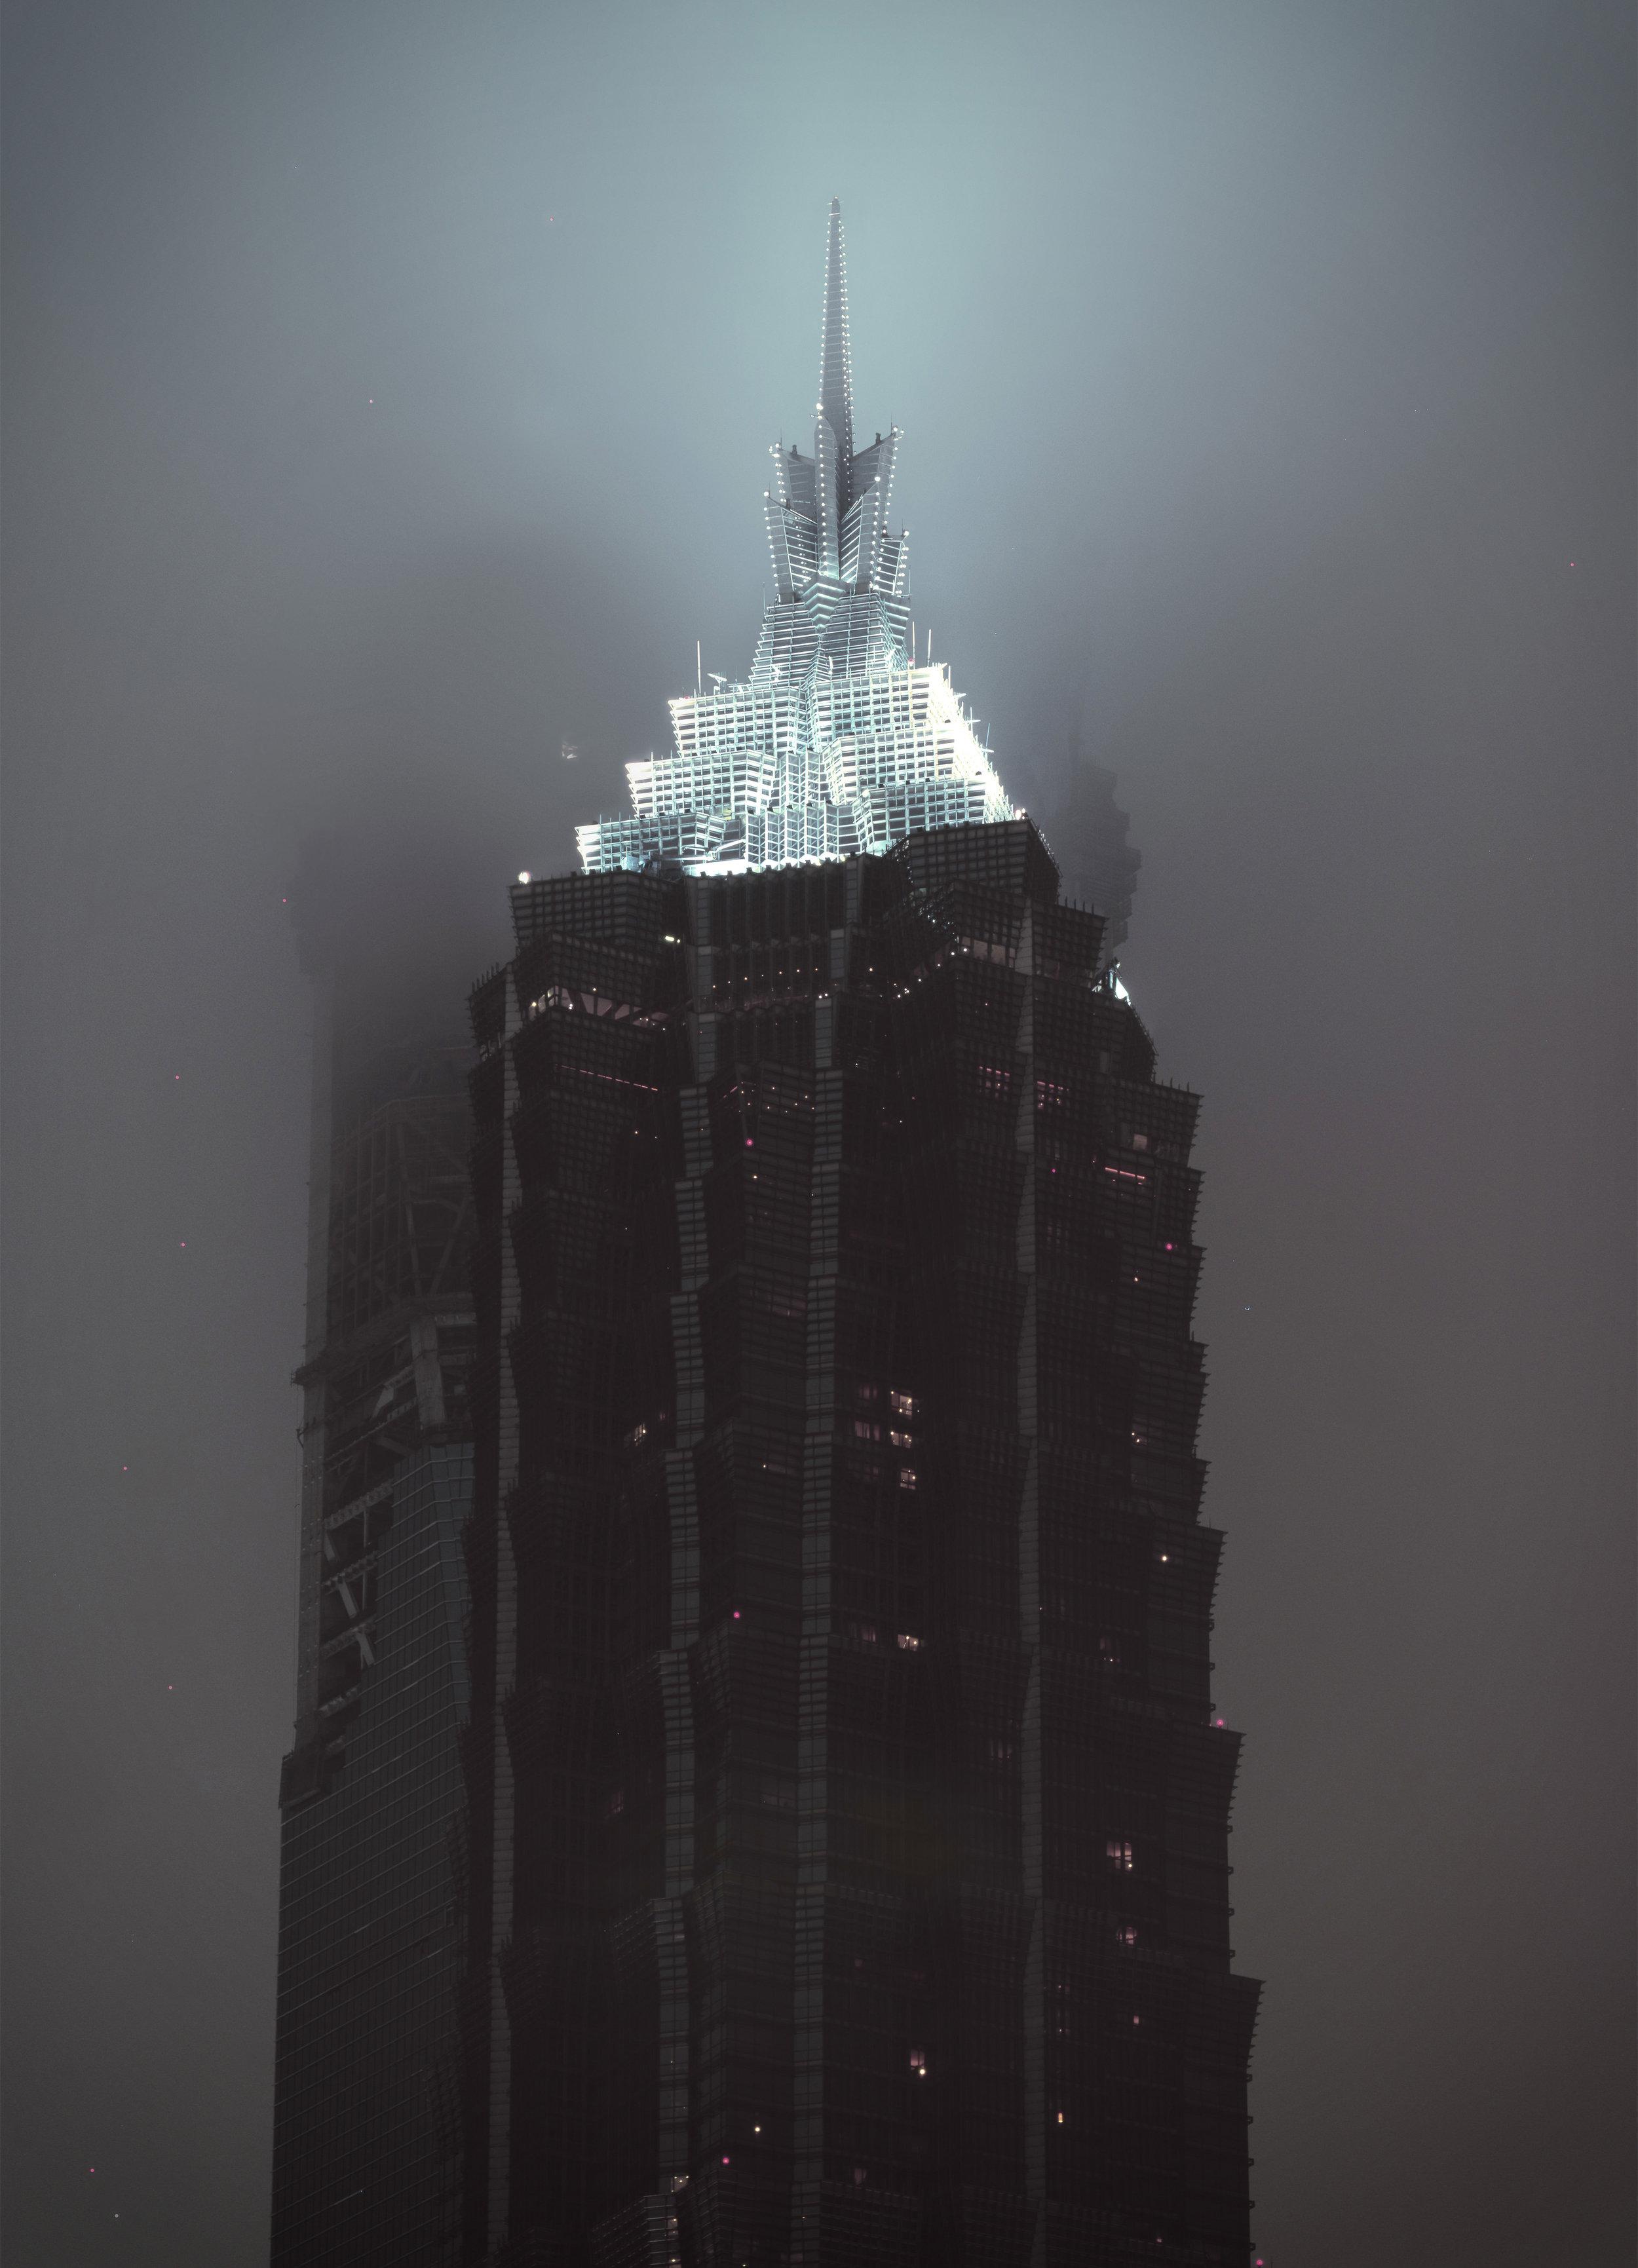 Top Jin Mao Tower - Shanghai, China 2002